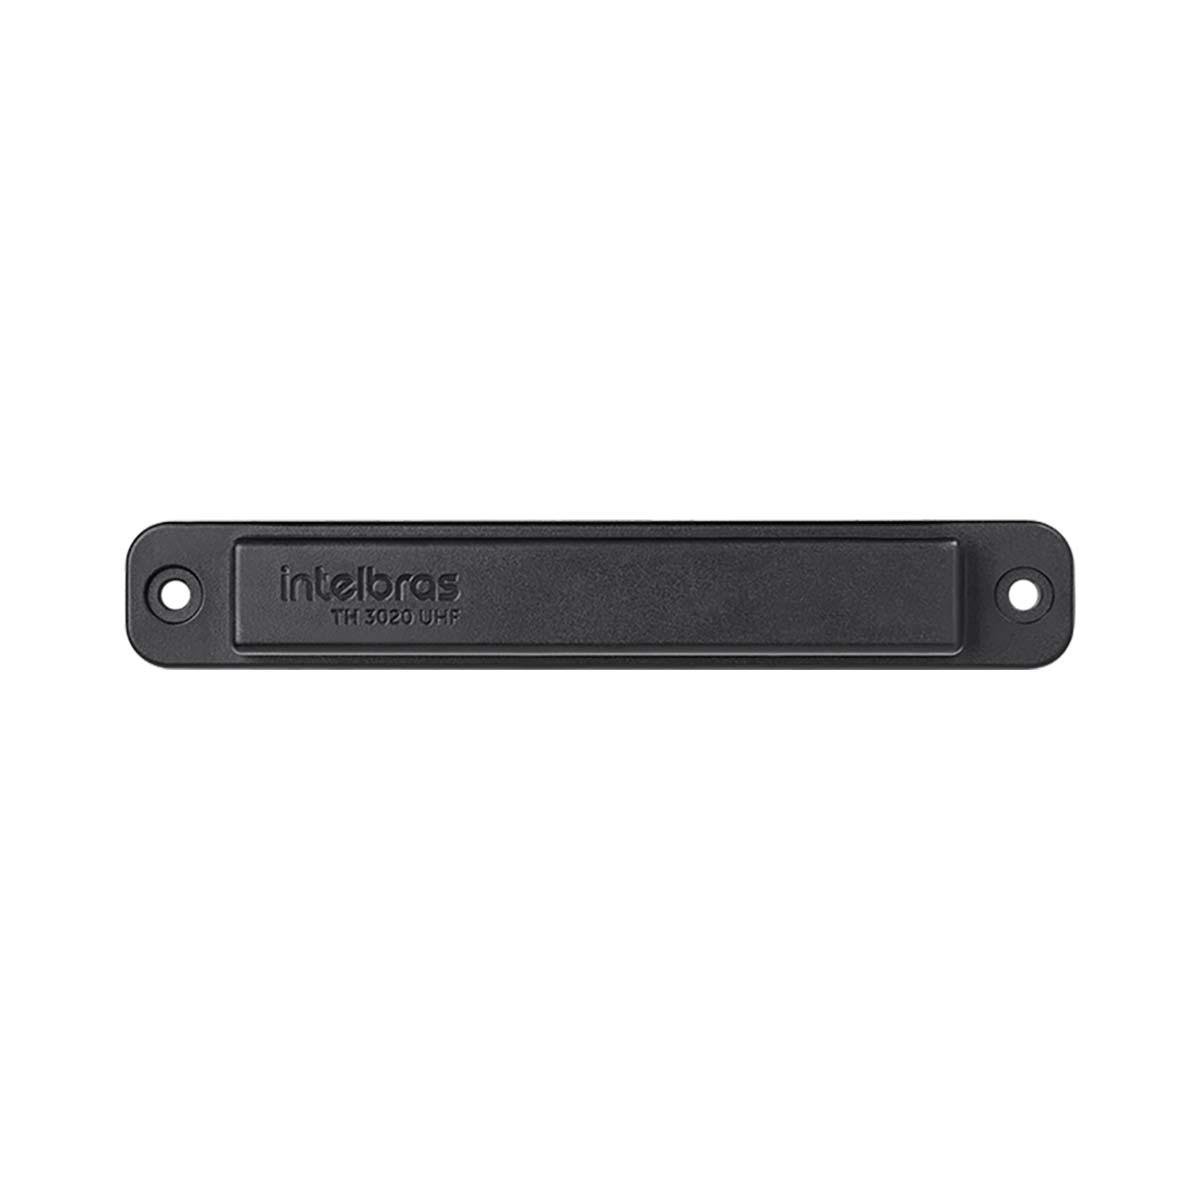 Kit 04 Etiqueta Veicular Intelbras Rfid 900mhz Th 3020 Uhf